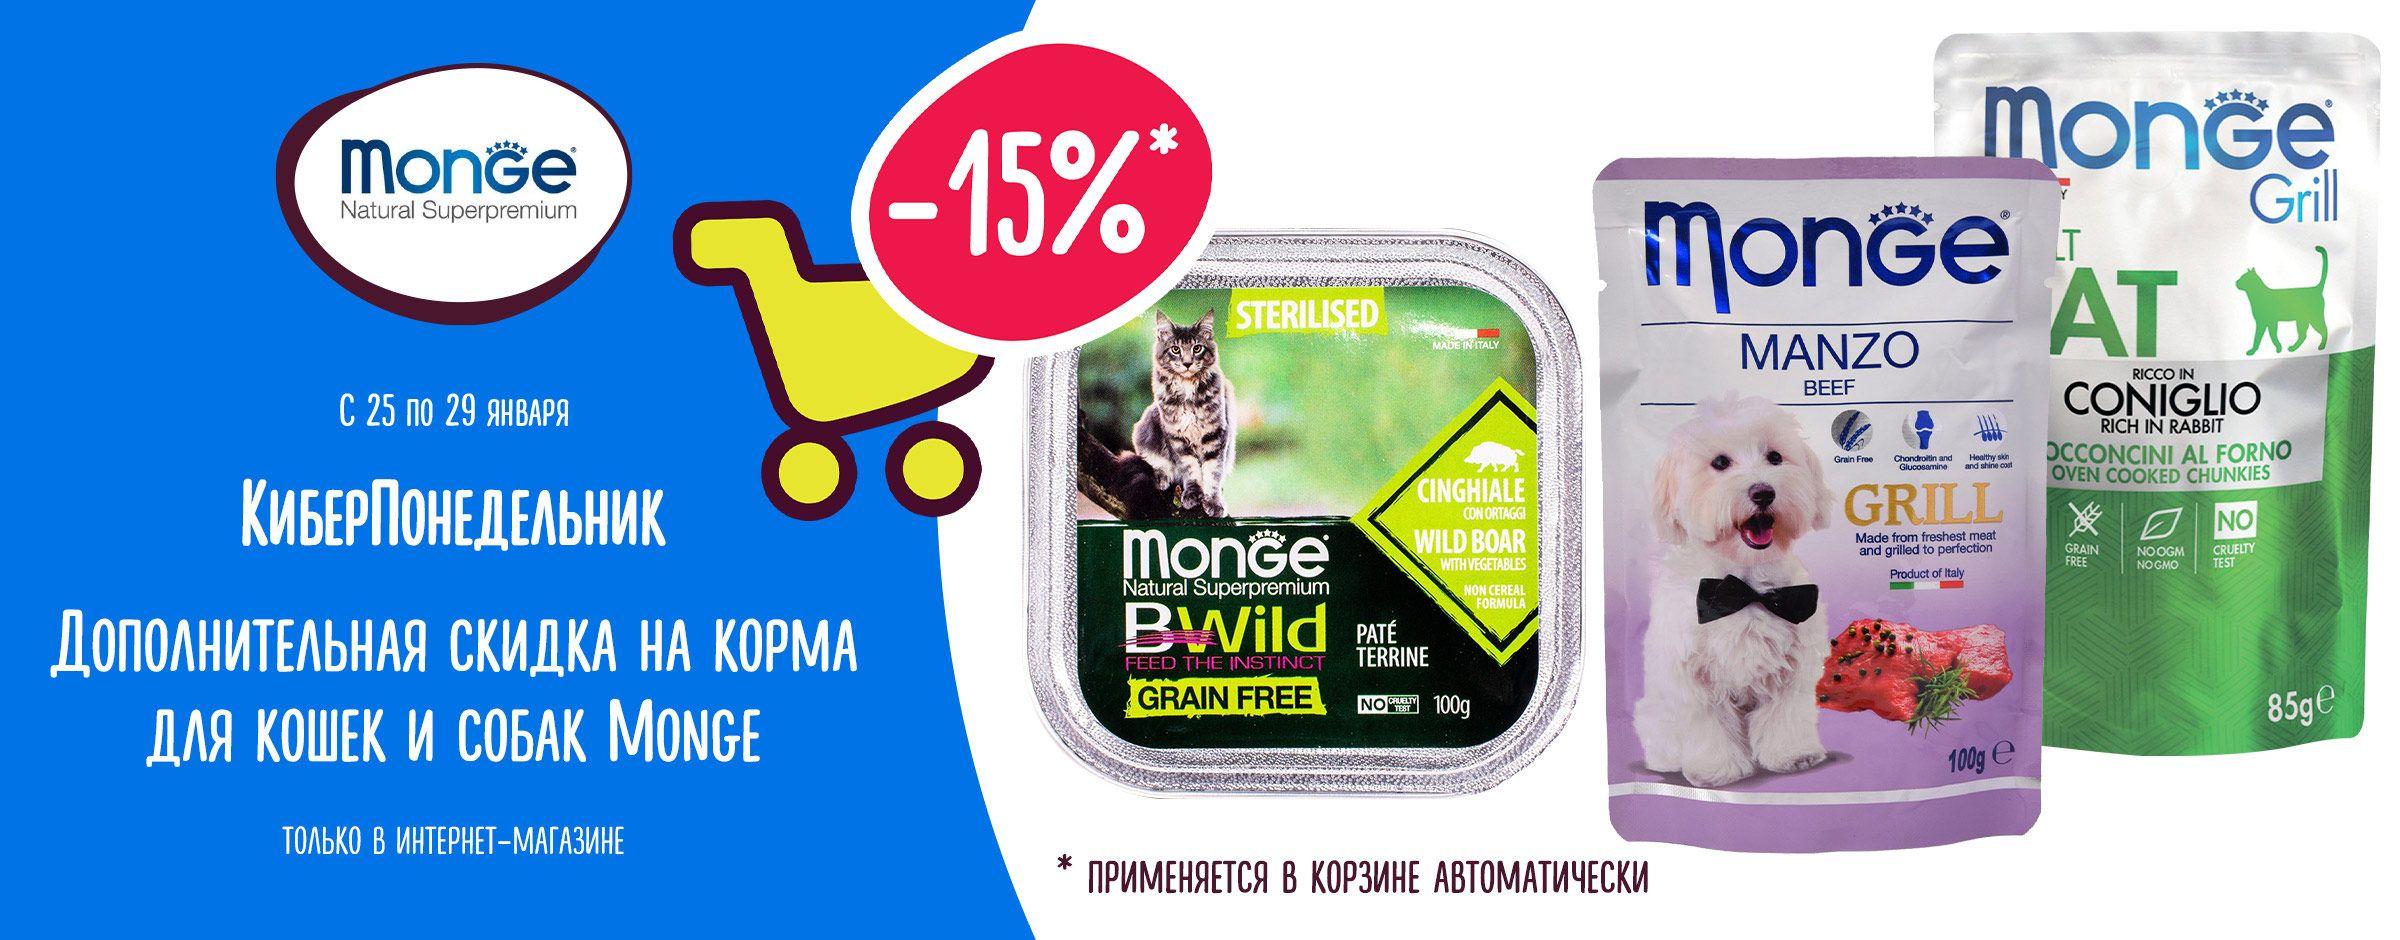 Доп. скидка 15% на корма для кошек и собак Monge в корзине